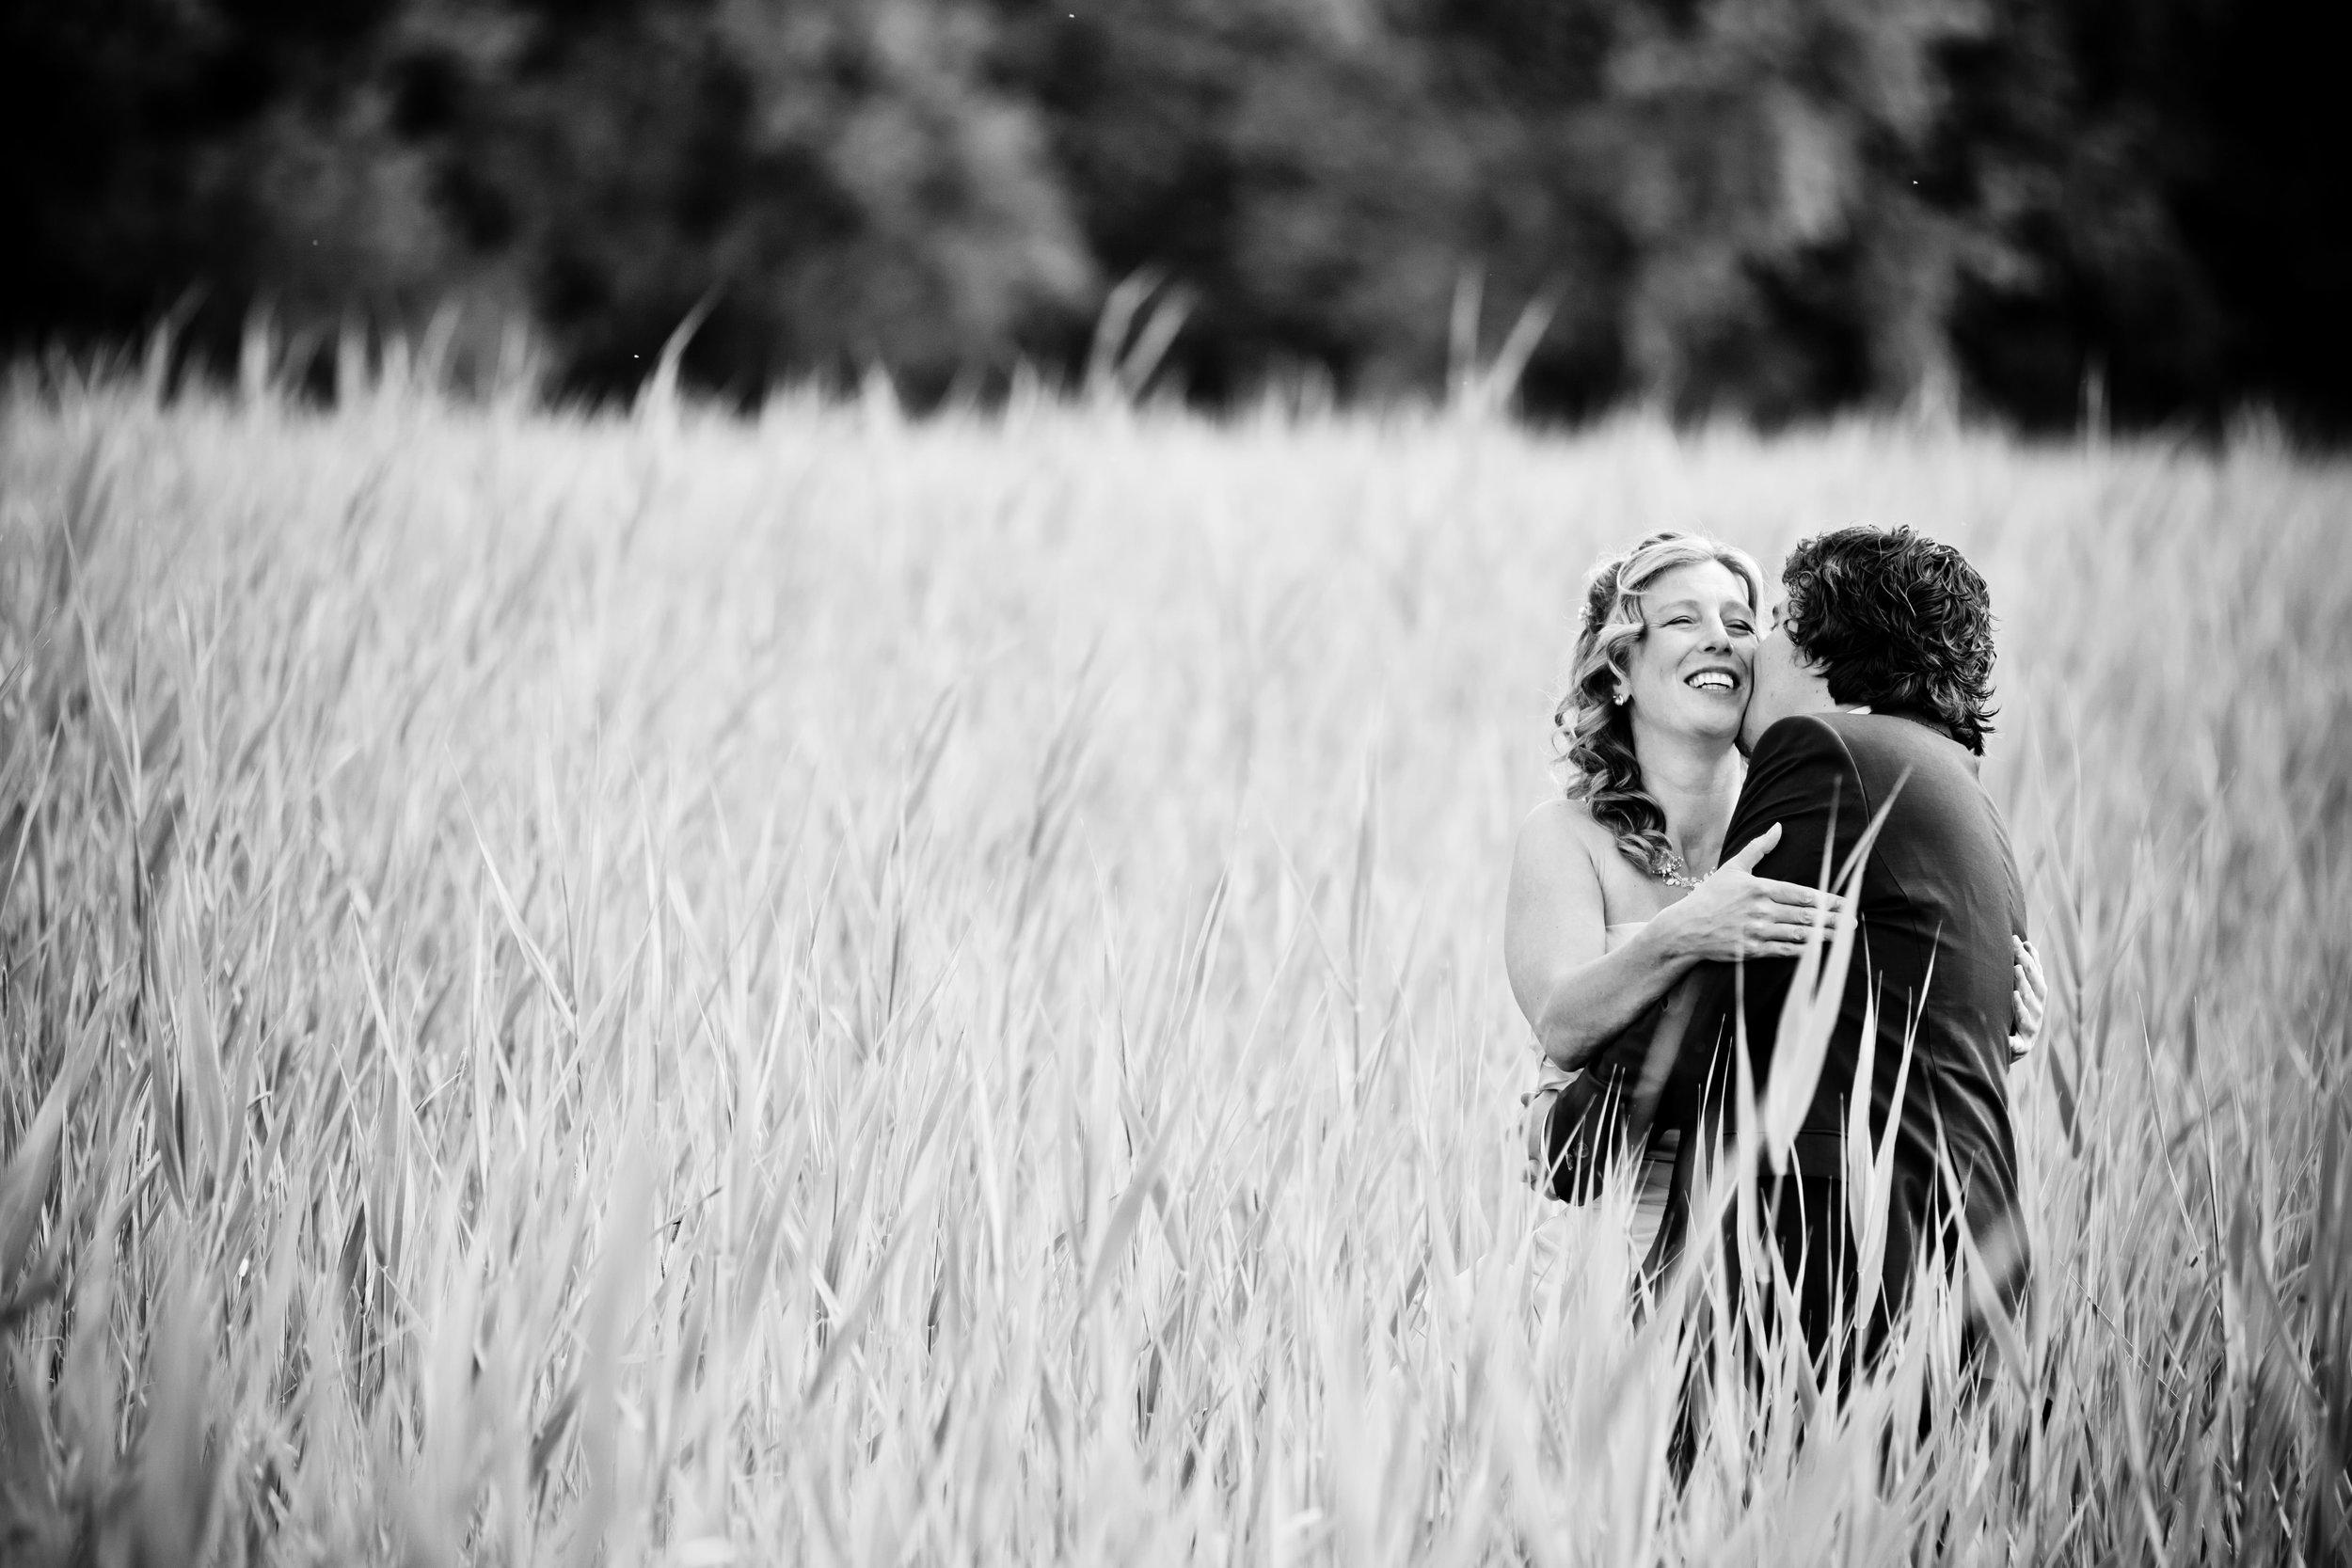 trouwshoot-bruidsfotografie-trouwfoto-feestfotografie-trouwreportage-Patricia en Arno547.jpg